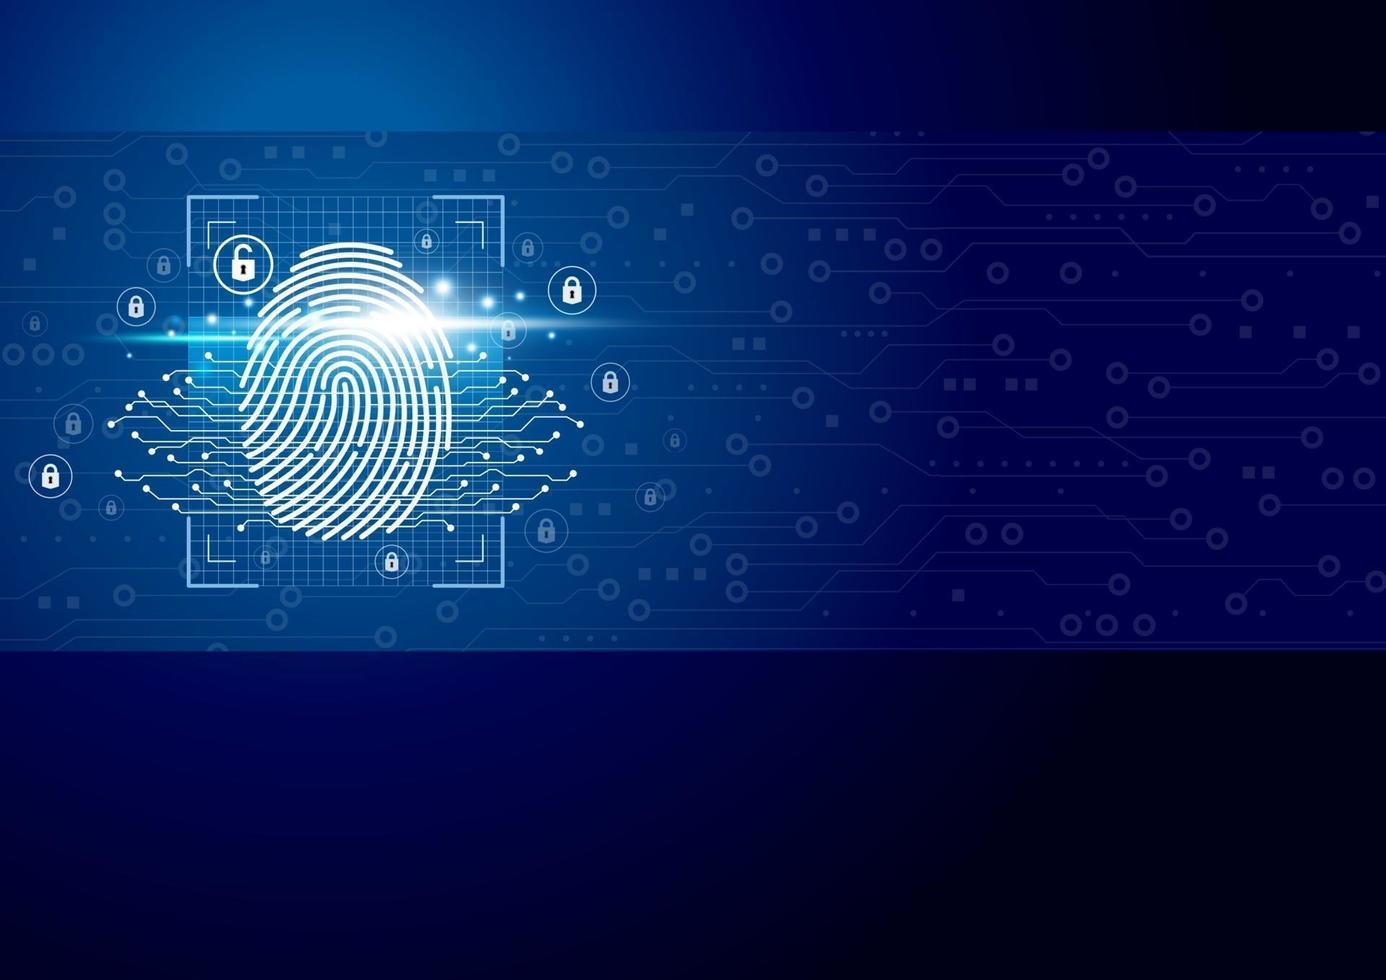 digitaler Fingerabdruckscanner mit Technologiehintergrundvektorillustration vektor